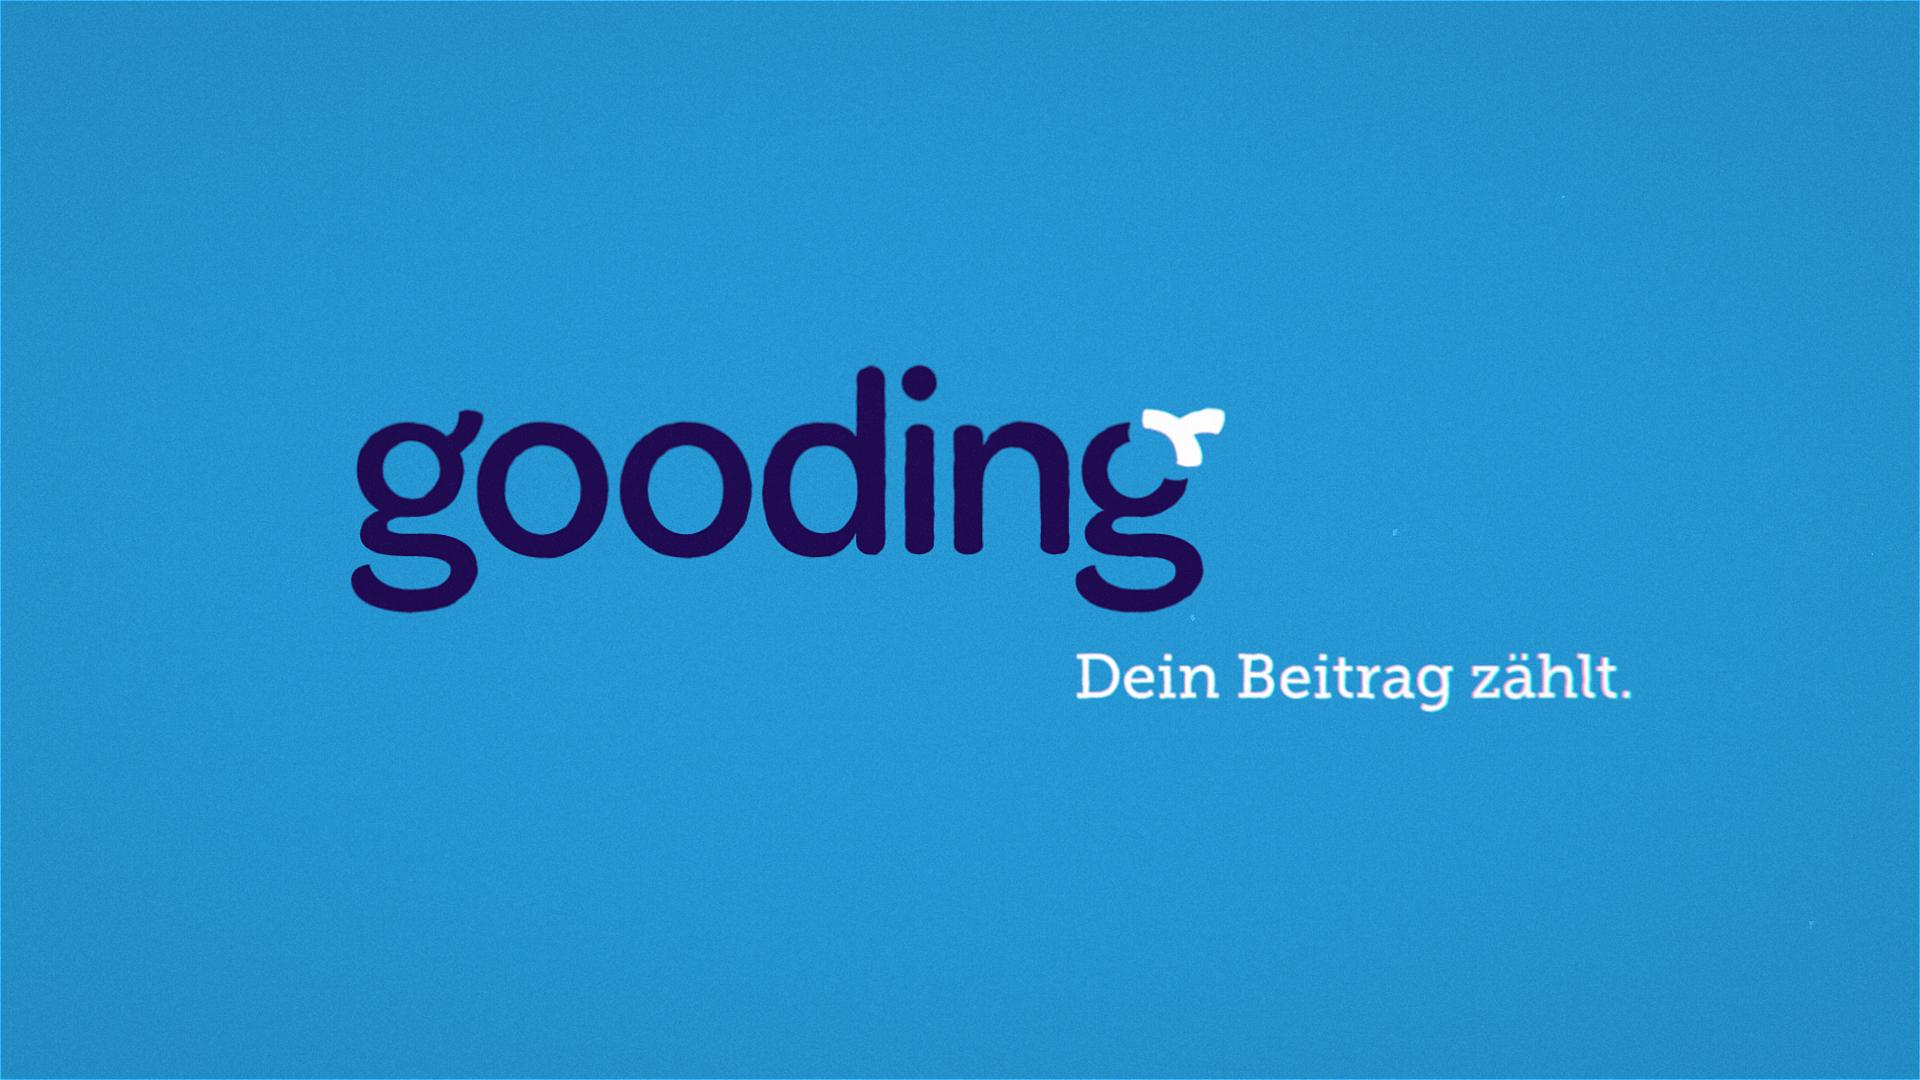 Gooding_08.jpg